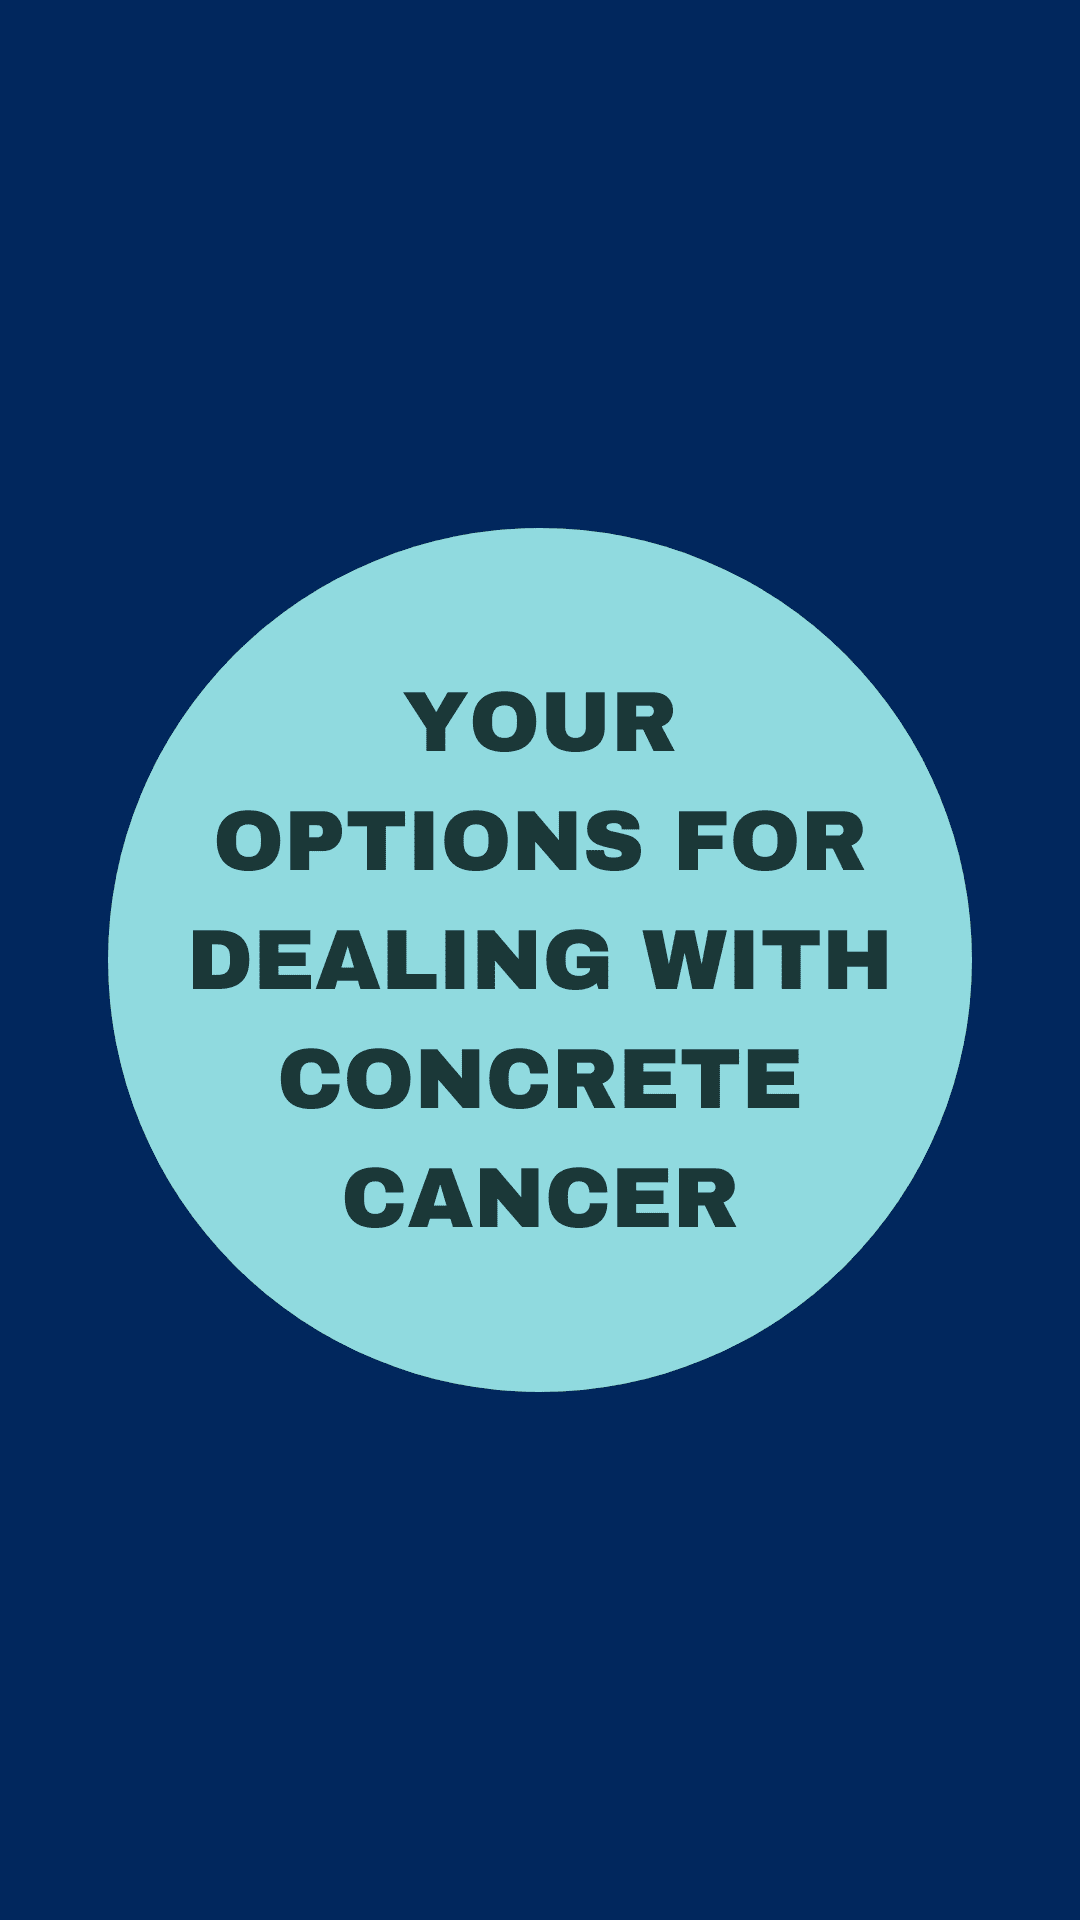 CONCRETE CANCER OPTIONS